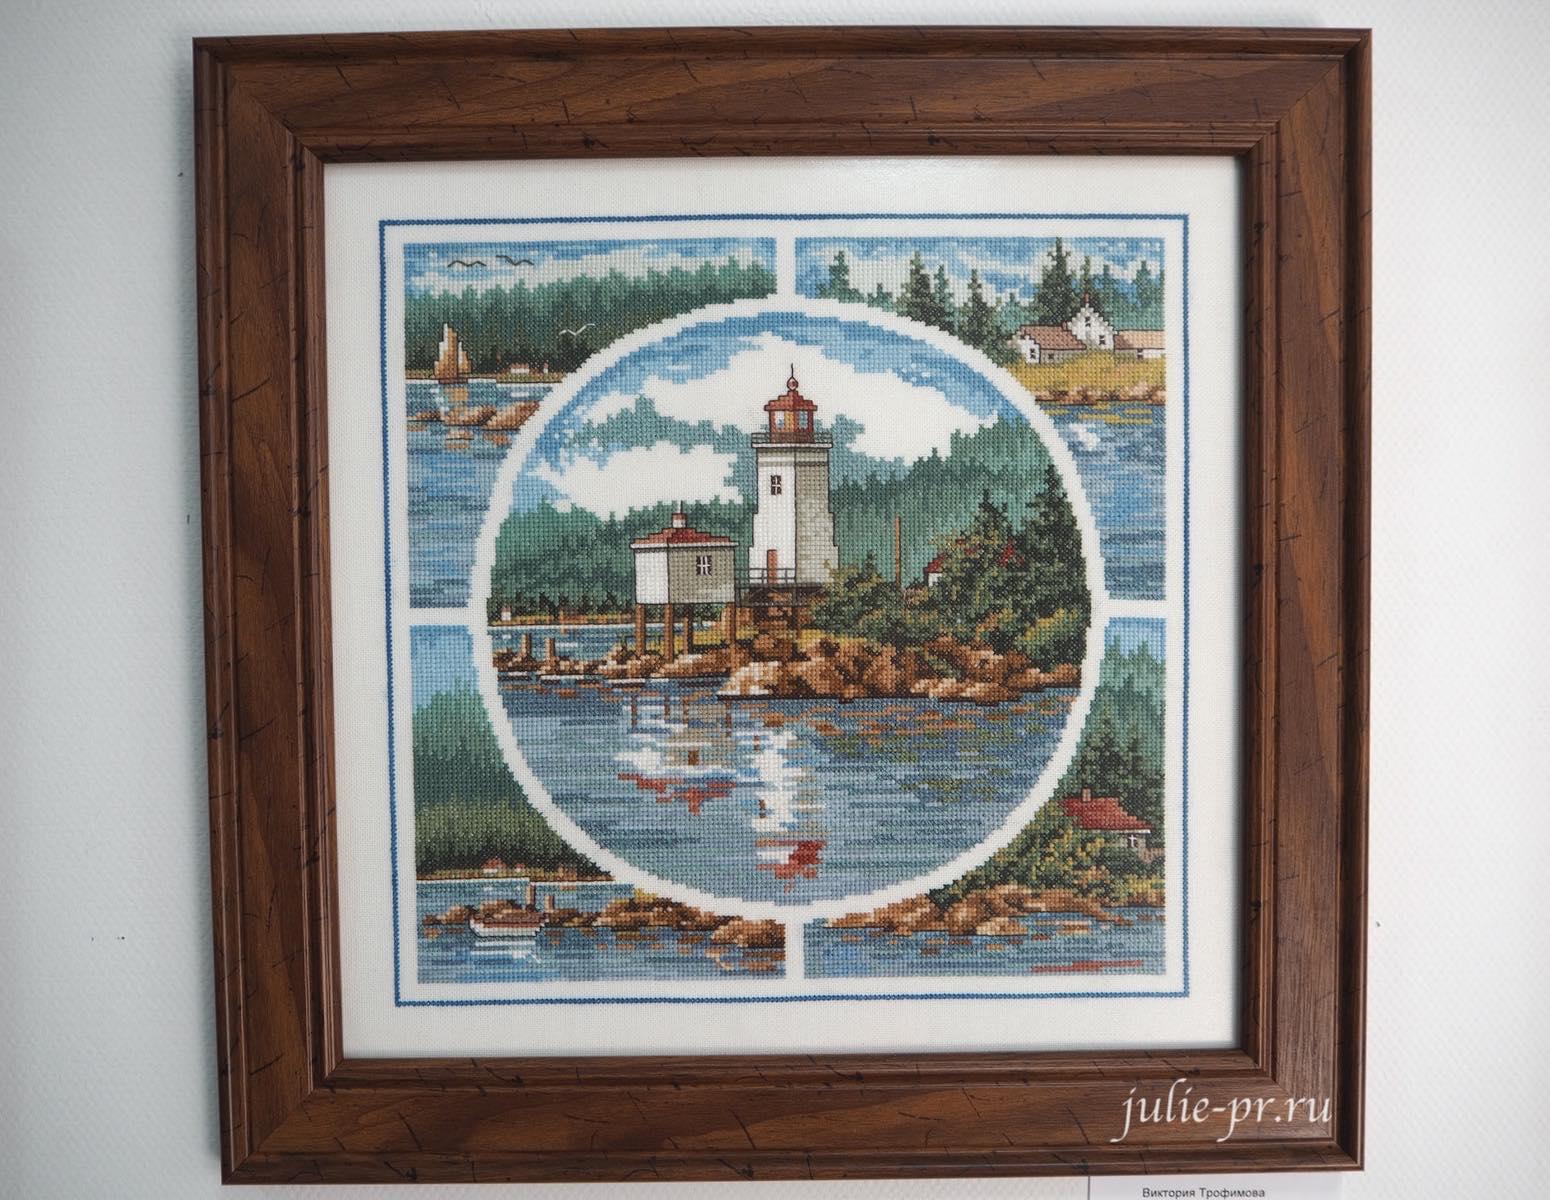 JCA, Northern Light, вышивка крестом, маяк